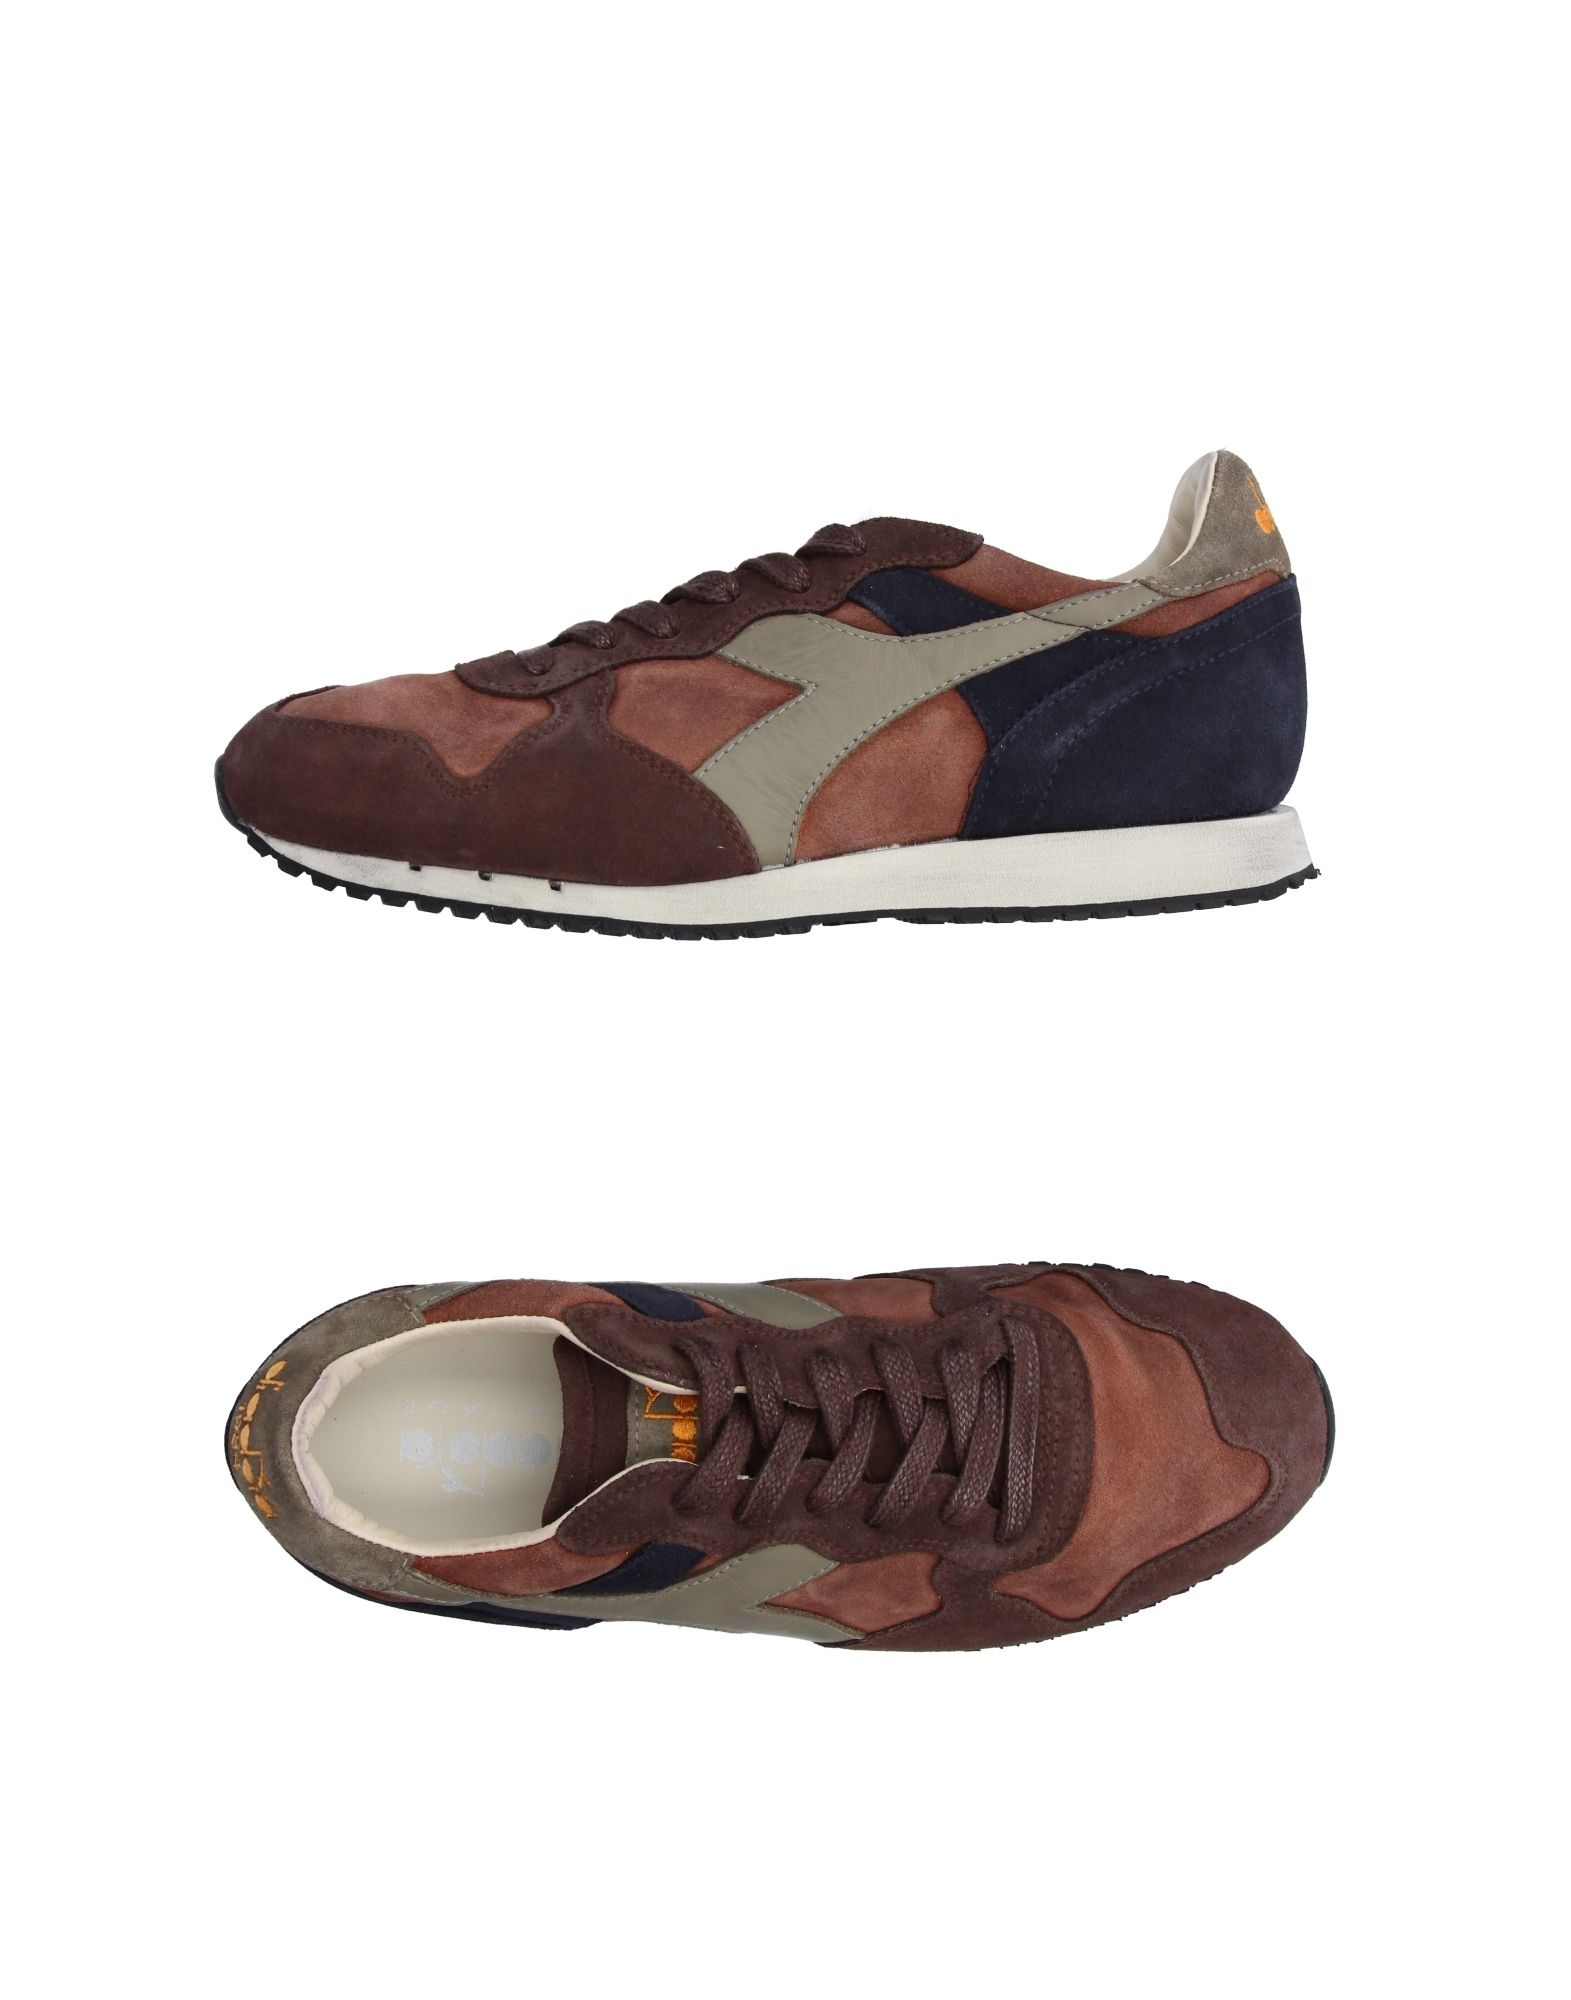 Diadora Heritage Sneakers Herren  11231307JI 11231307JI 11231307JI Neue Schuhe e226c0